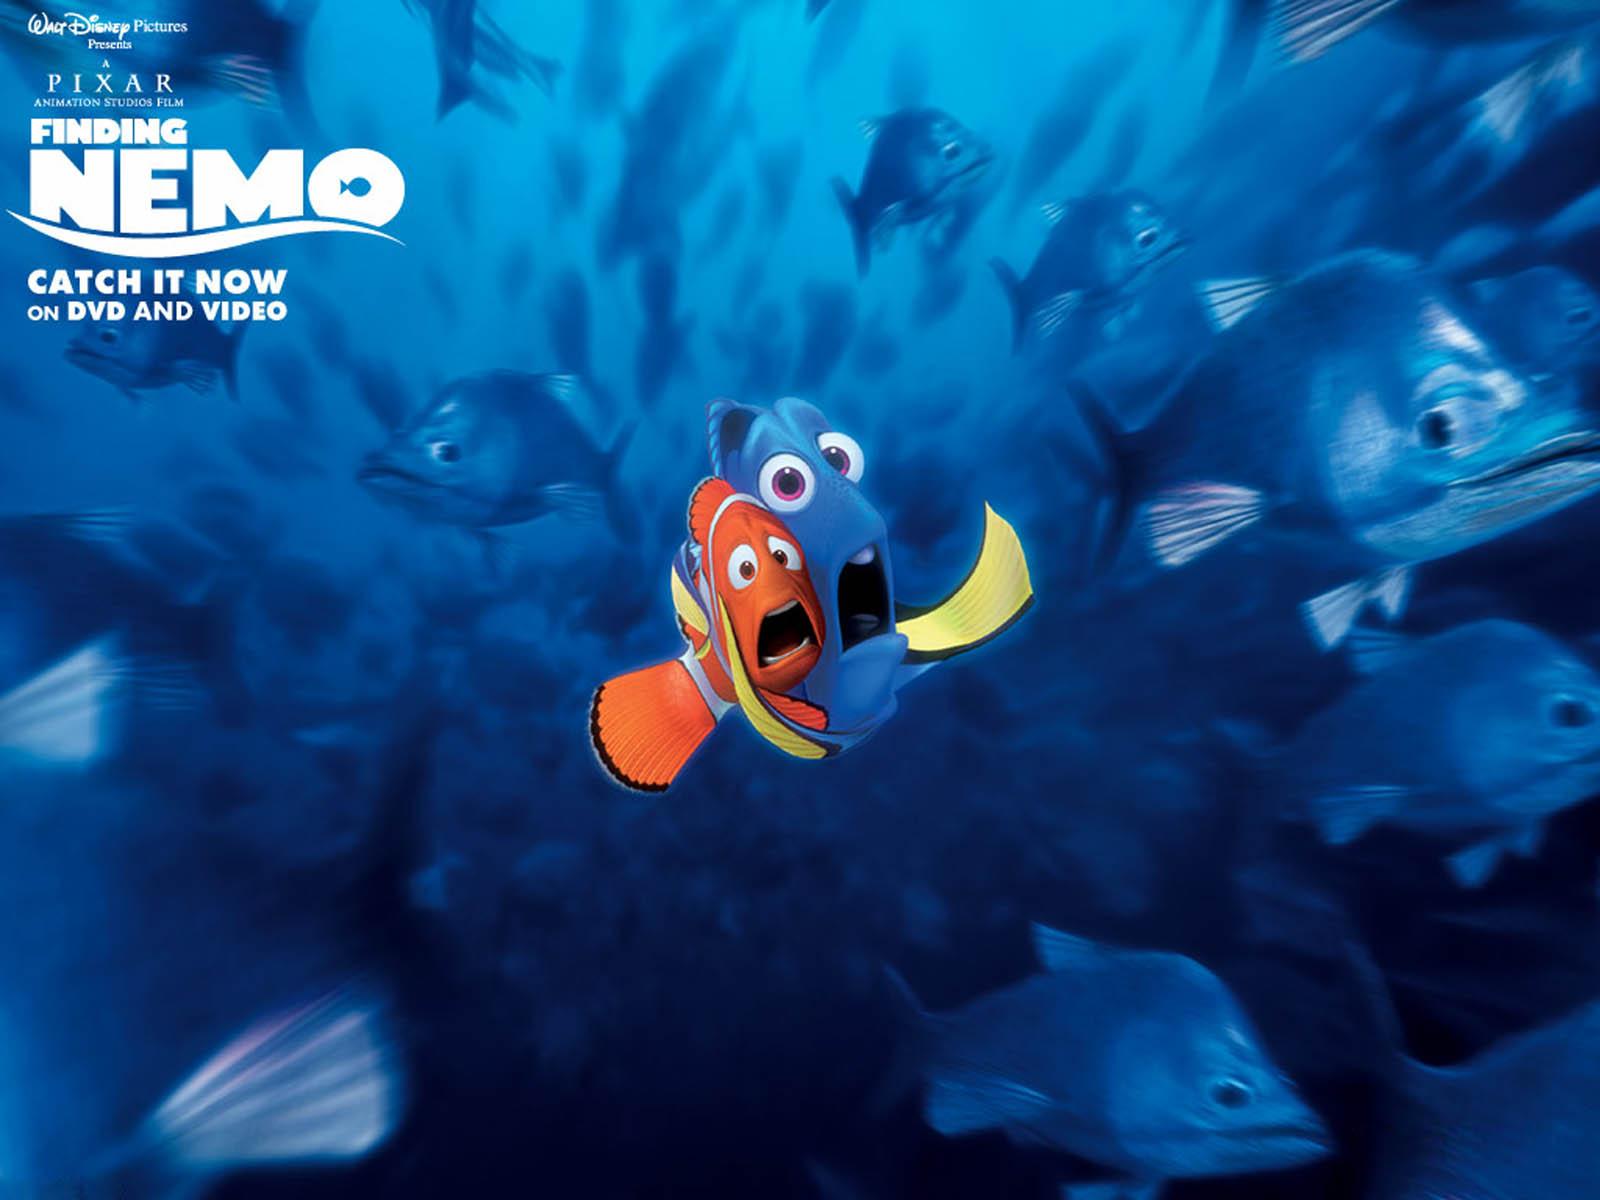 wallpaper: Finding Nemo Wallpapers